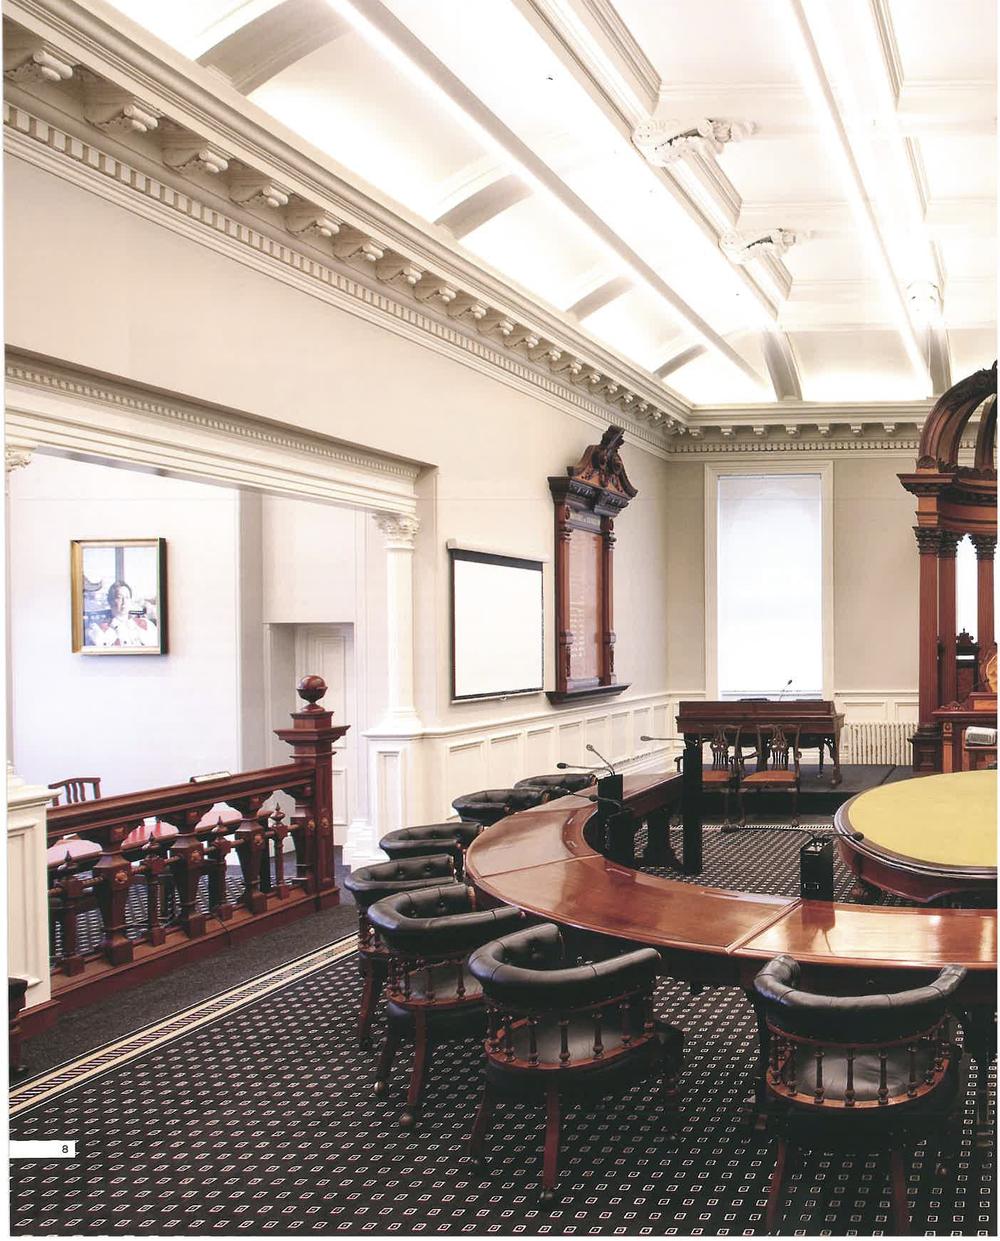 Dunedin Town Hall - Interiors Article Dec - Feb 2014 - 2015_7.jpg